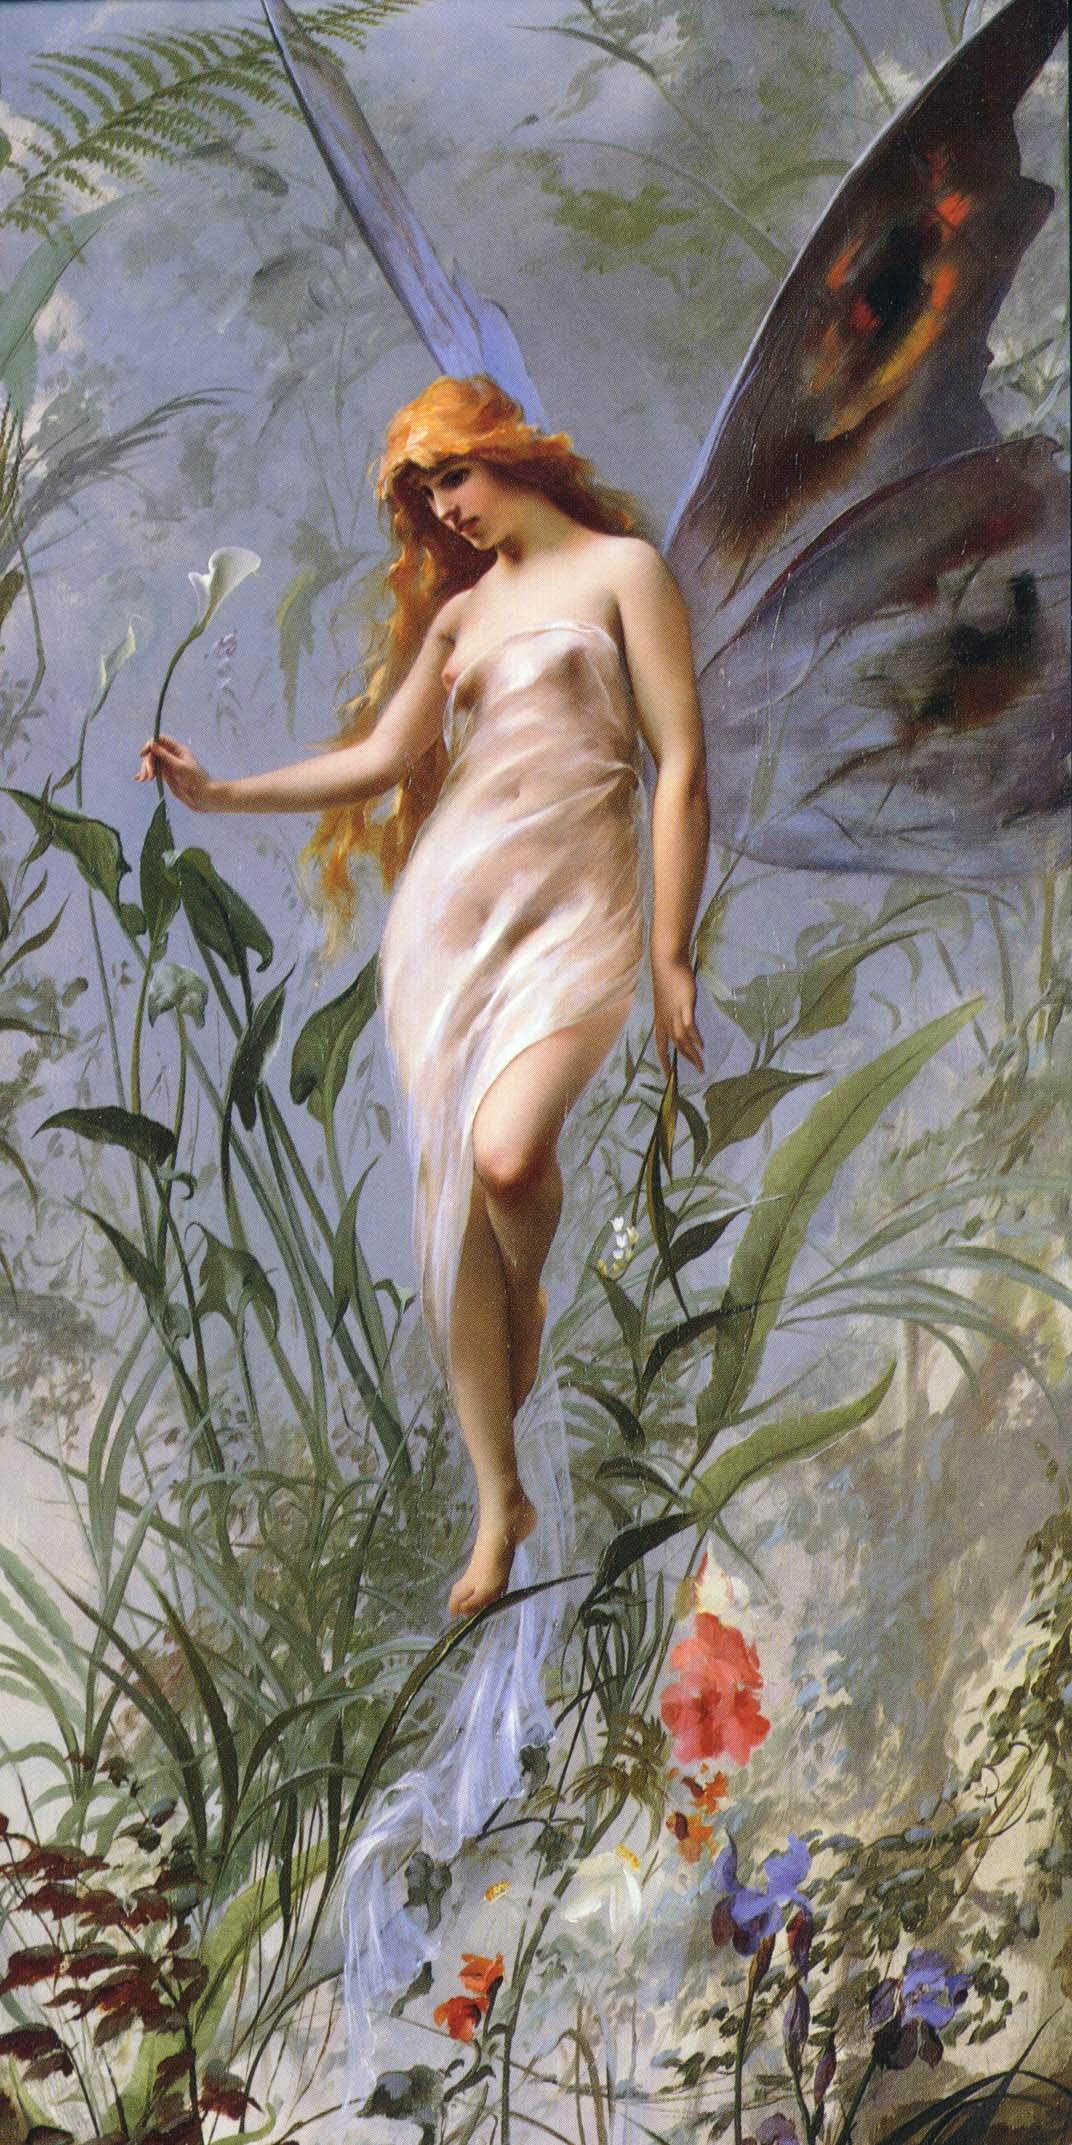 Fairies (folklore)